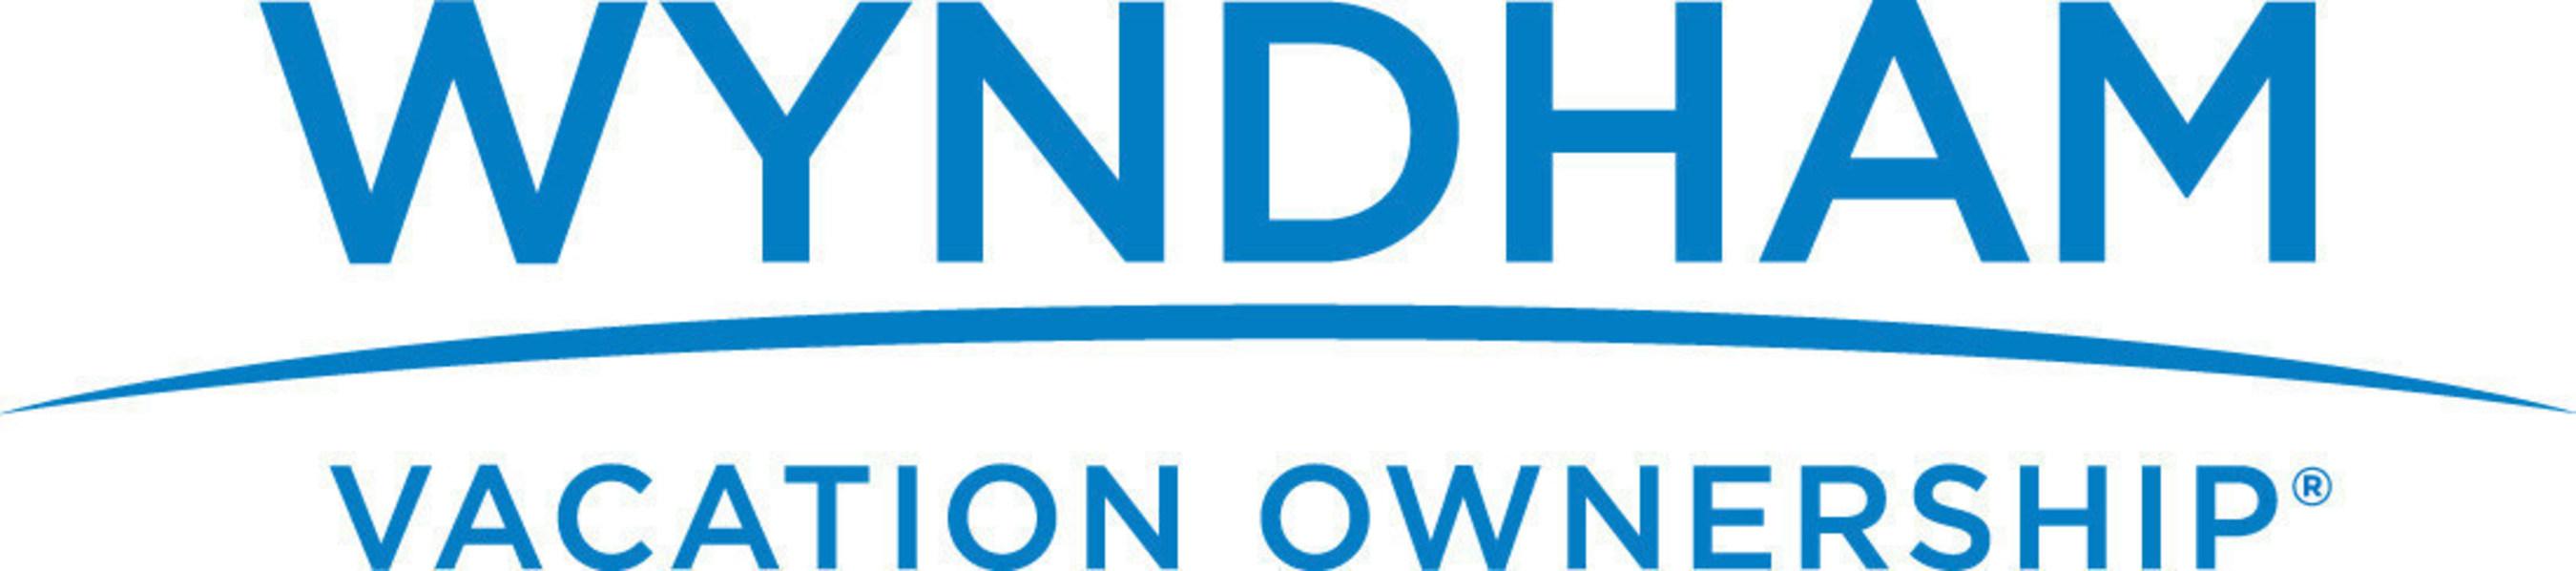 Wyndham Vacation Ownership